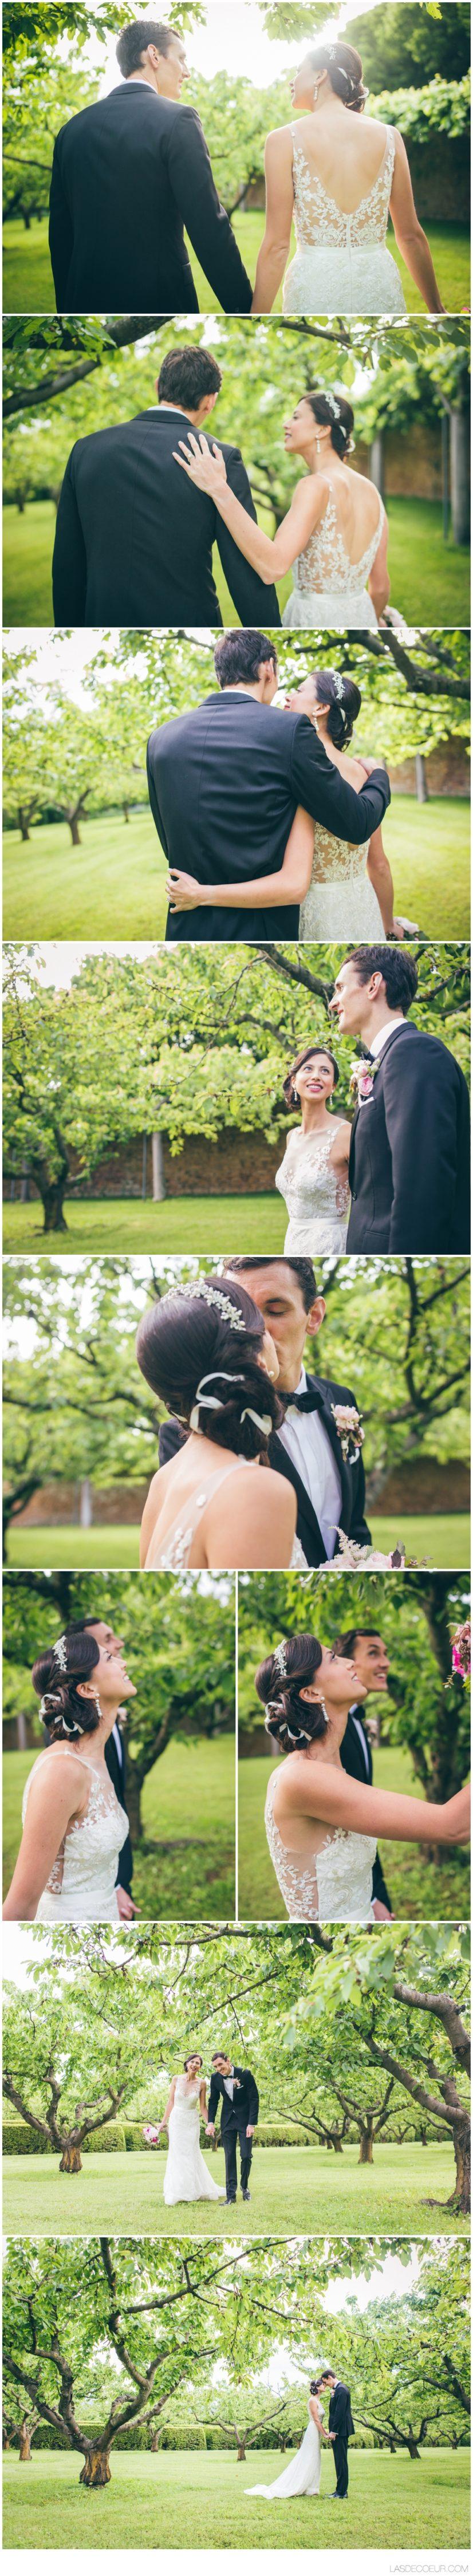 Photographe et vidéaste mariage Lyon photo couple ©lasdecoeur